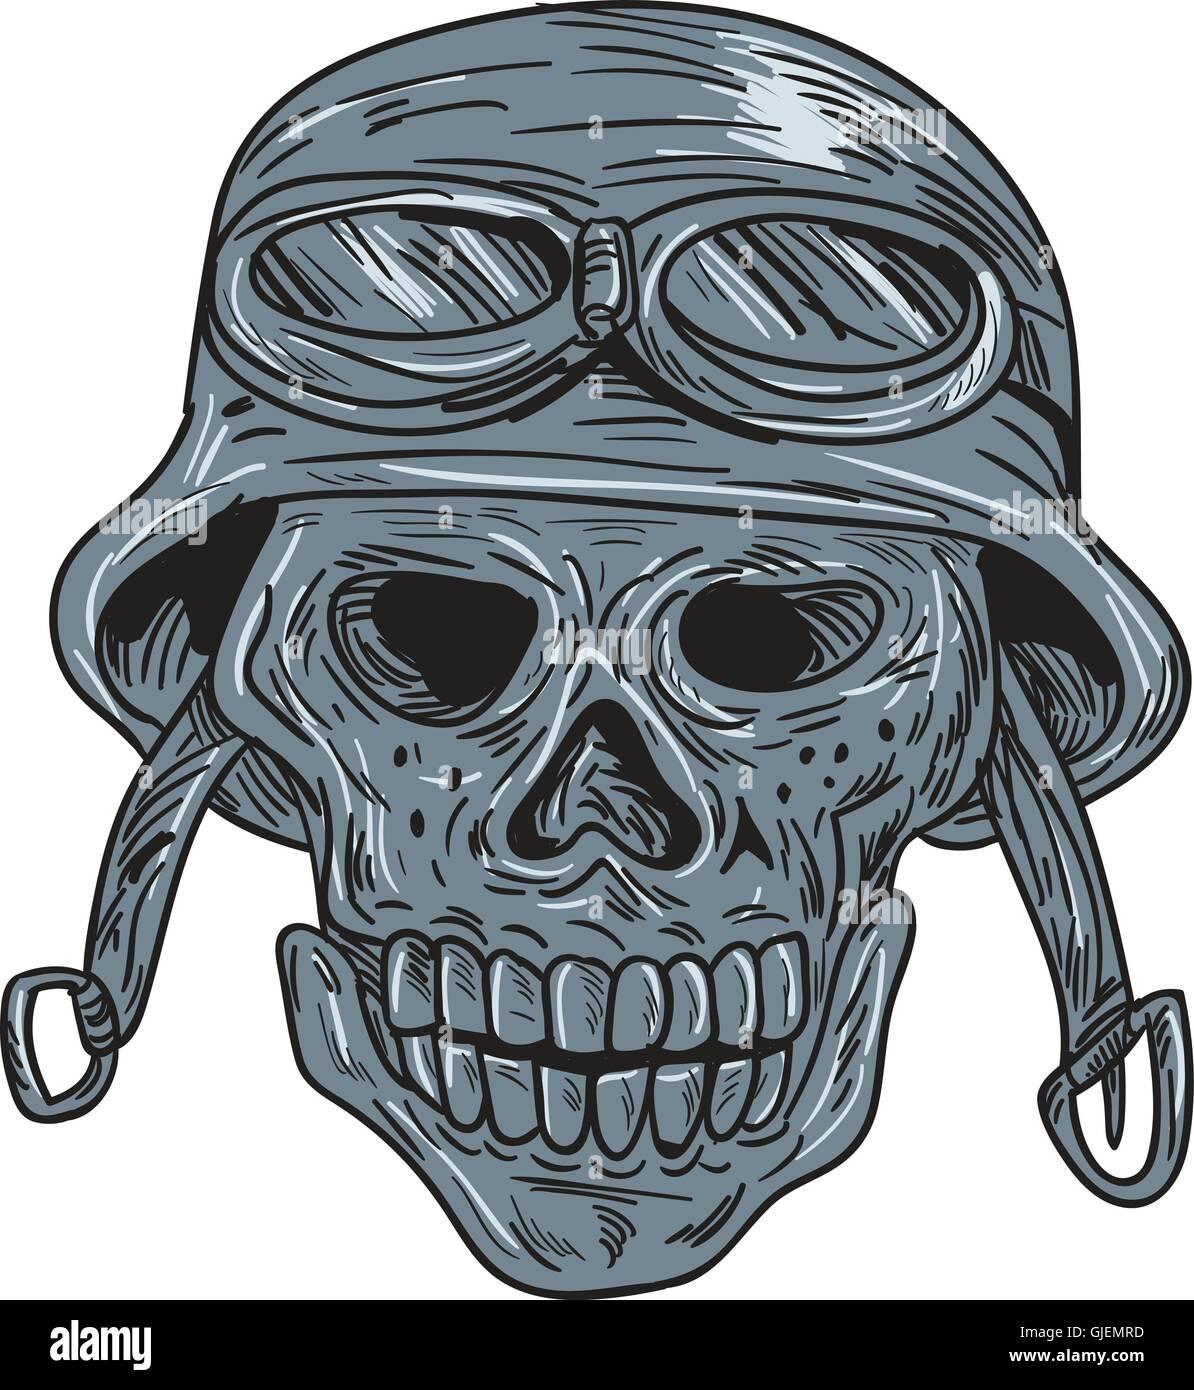 Drawing Sketch Style Illustration Of A Skull Biker Wearing Bike